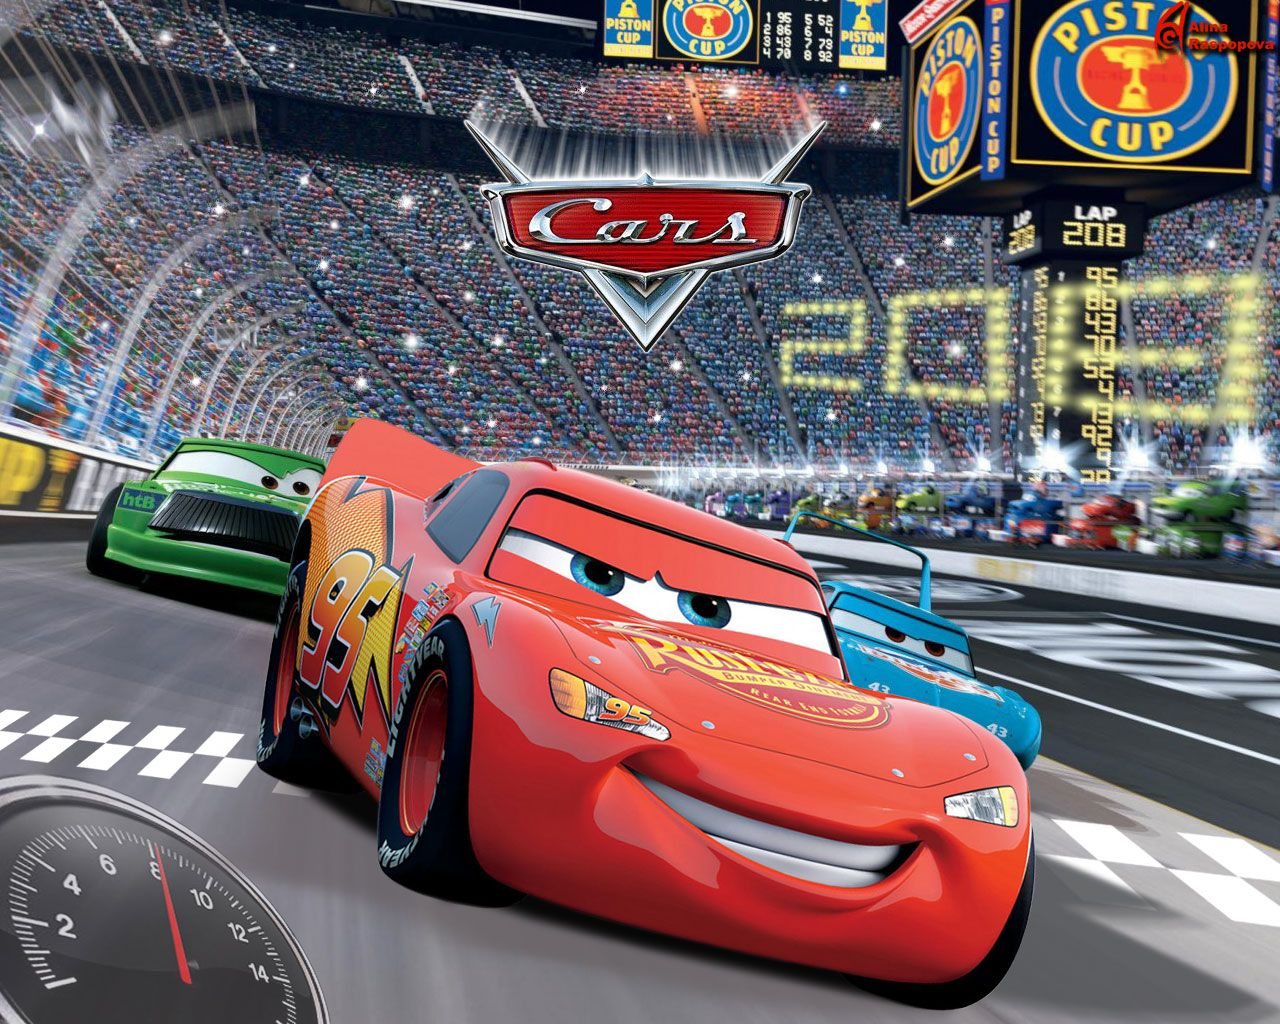 Disney Cars 2 HD Wallpaper For IPad Mini 3   Cartoons Wallpapers